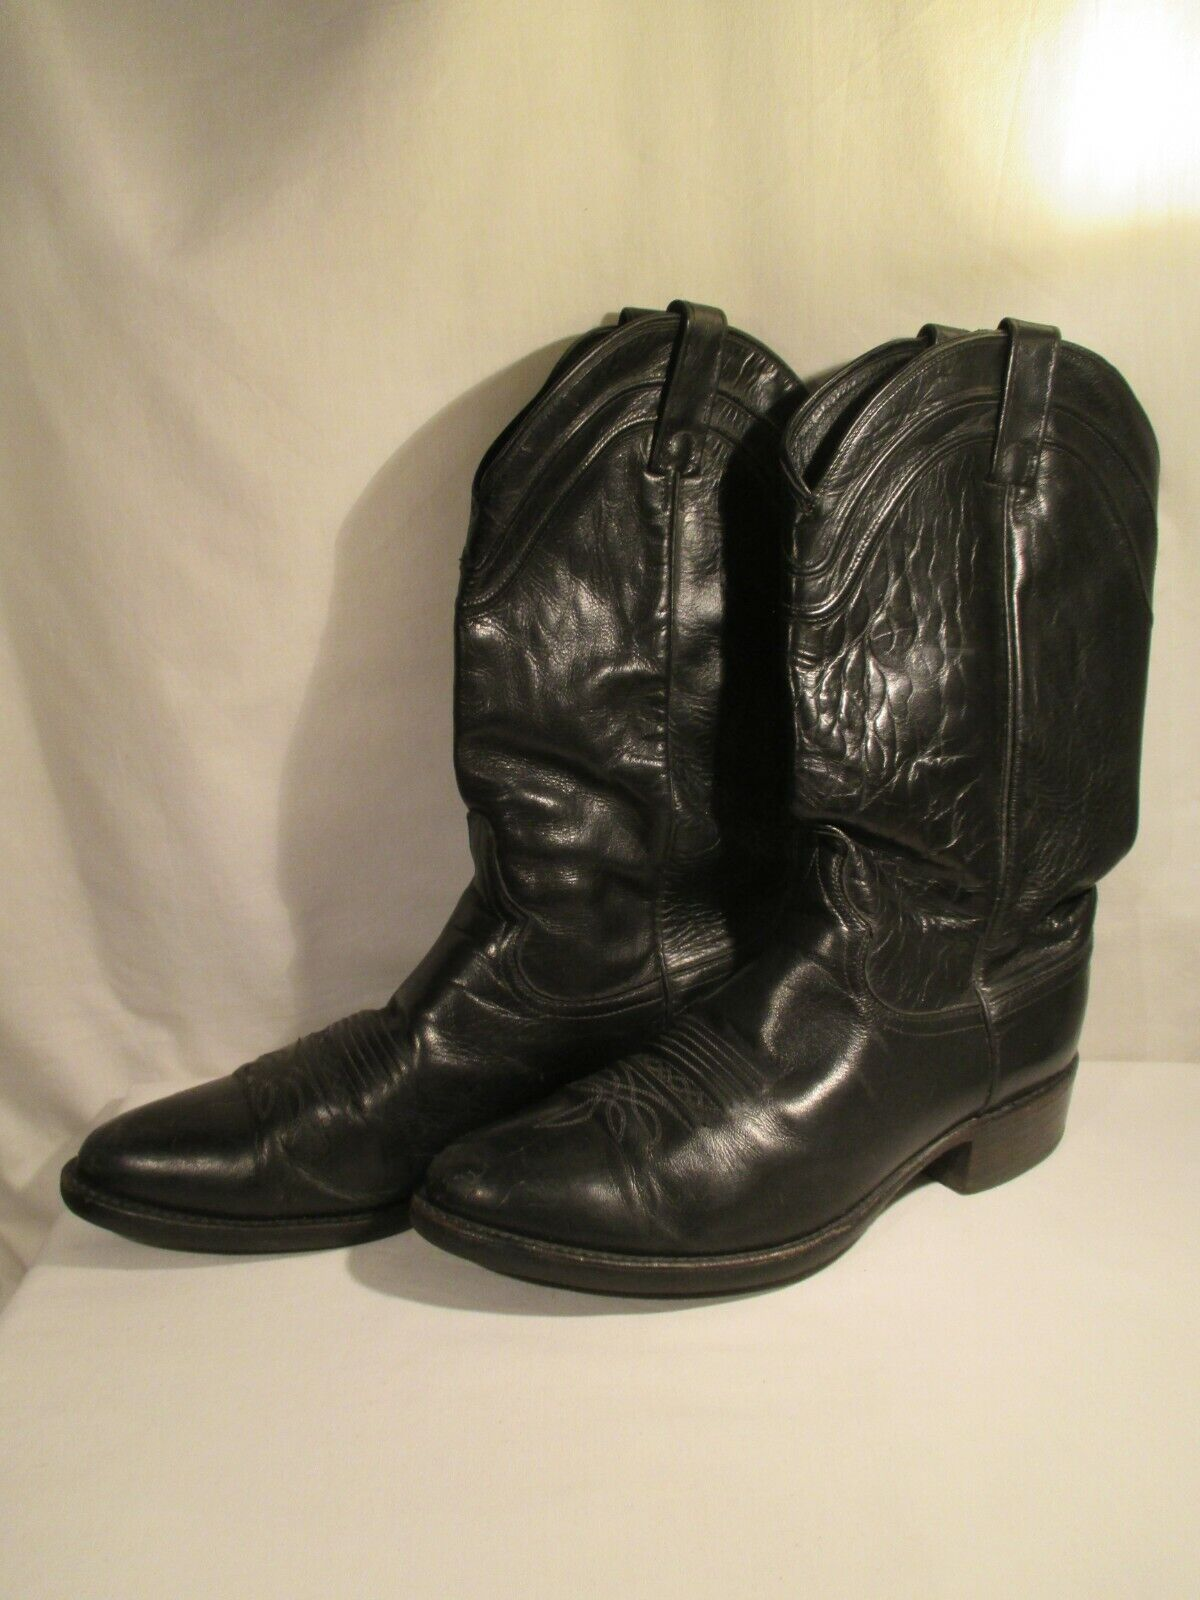 Vintage Dan Post USA Western Biker Boots 43 Punk New Wave Gothic Heavy Metal